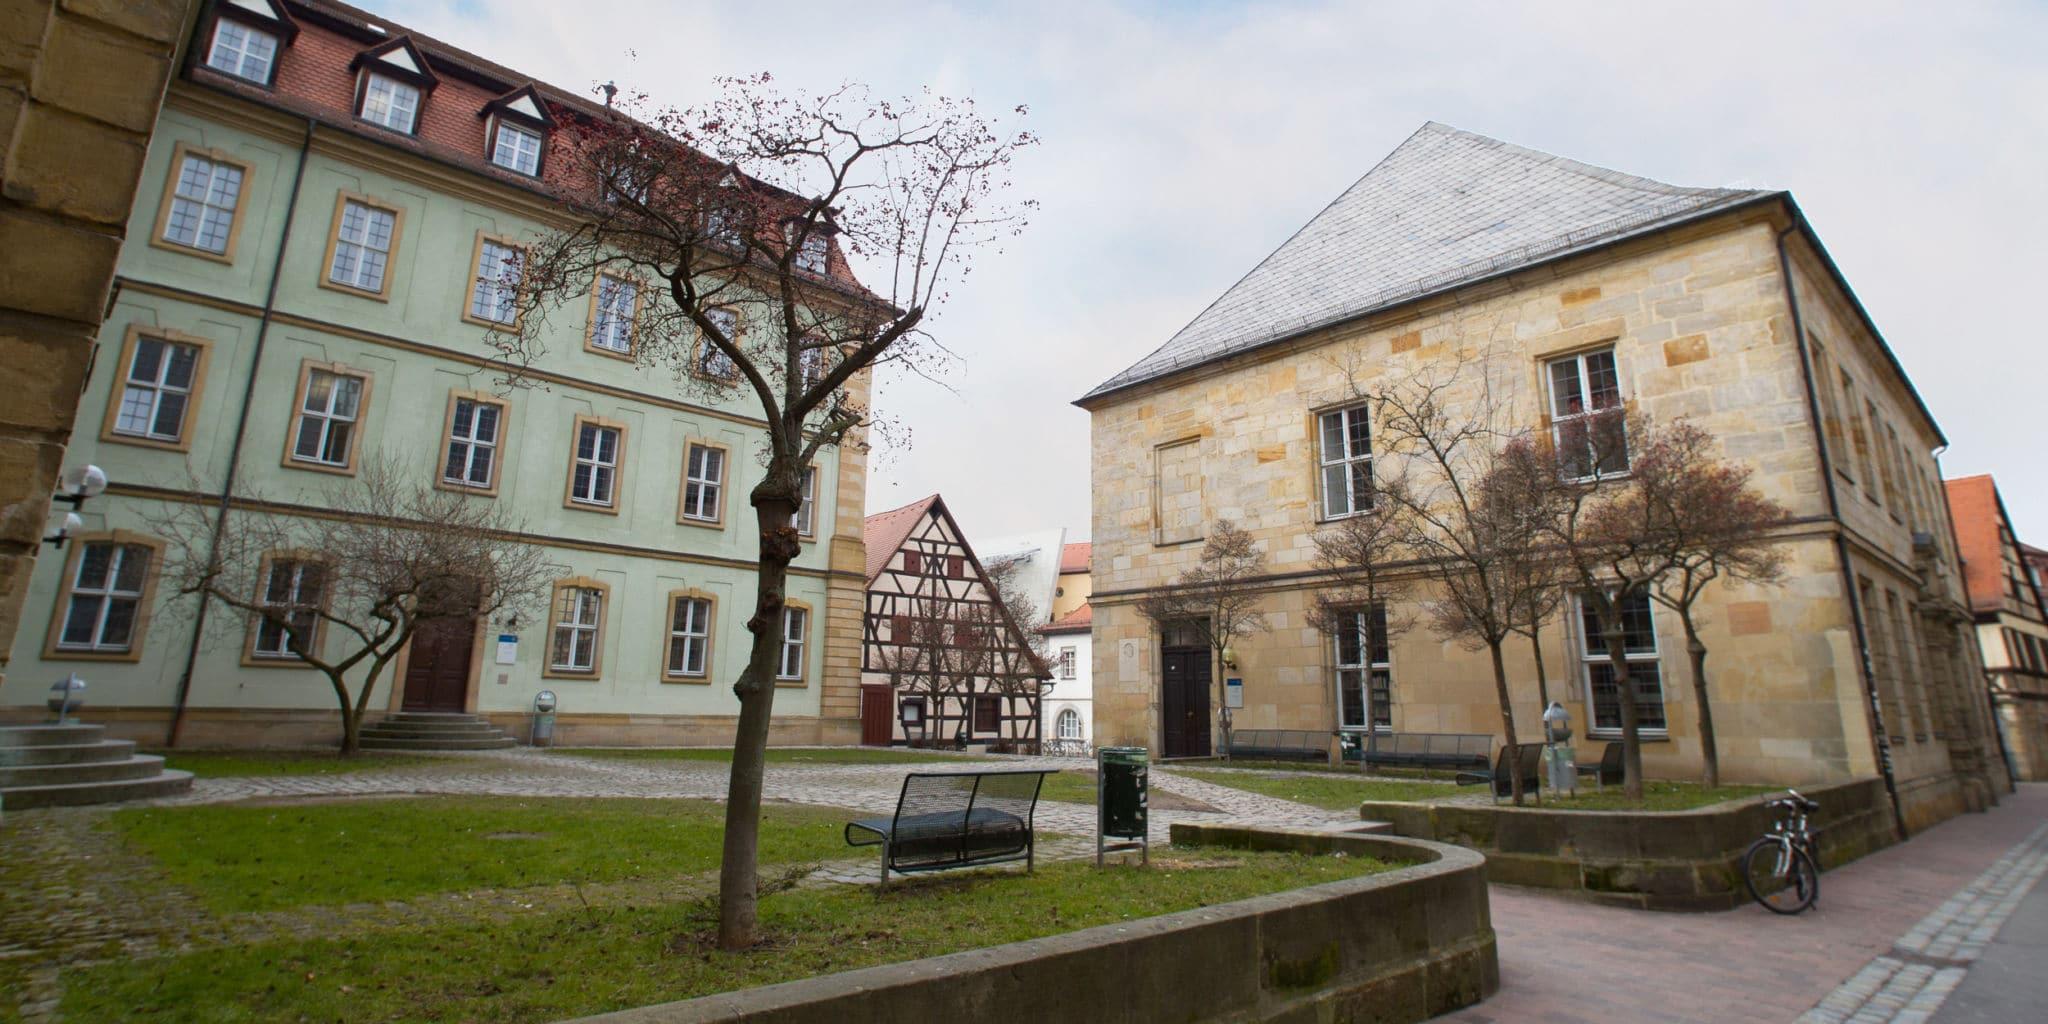 universitaet bamberg - Otto-Friedrich-Universität Bamberg